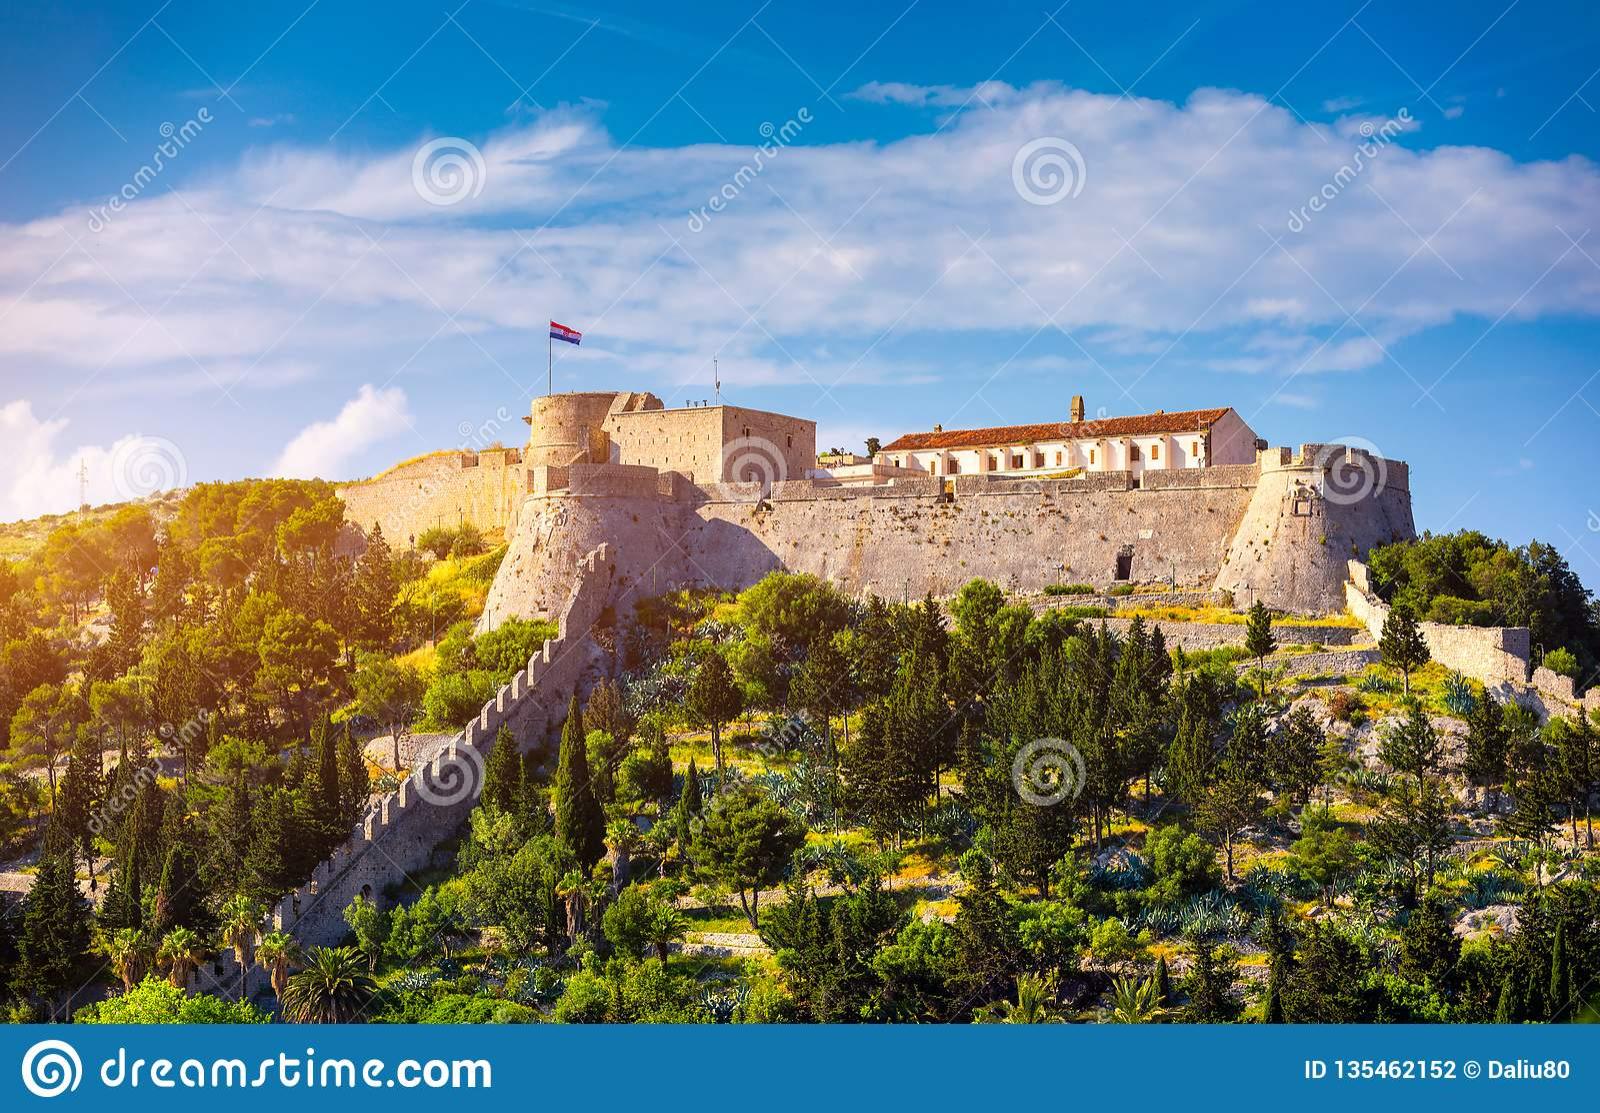 Fortica堡垒(西班牙堡垒或Spanjola Fortres)在赫瓦尔海岛上在克罗地亚 在赫瓦尔海岛上的古老堡垒在镇(